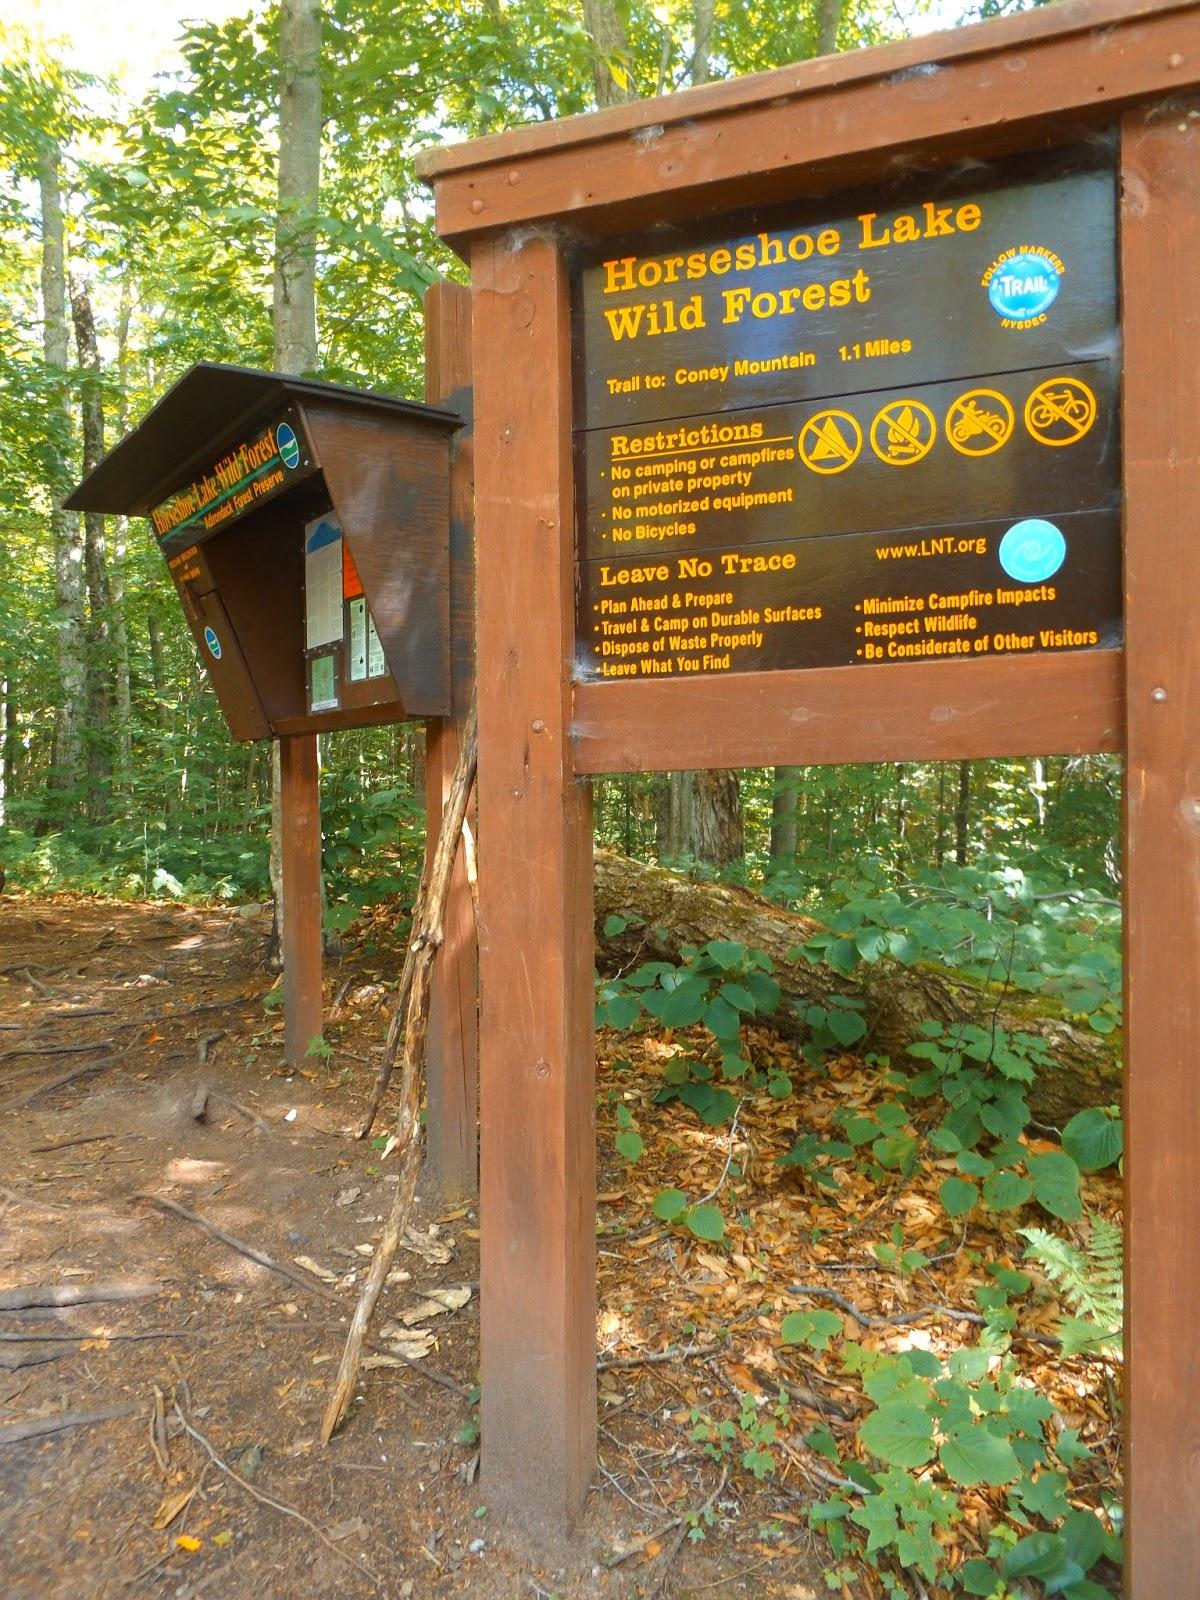 Walking Man 24 7: Kibby Pond & Coney Mountain(Adirondacks)